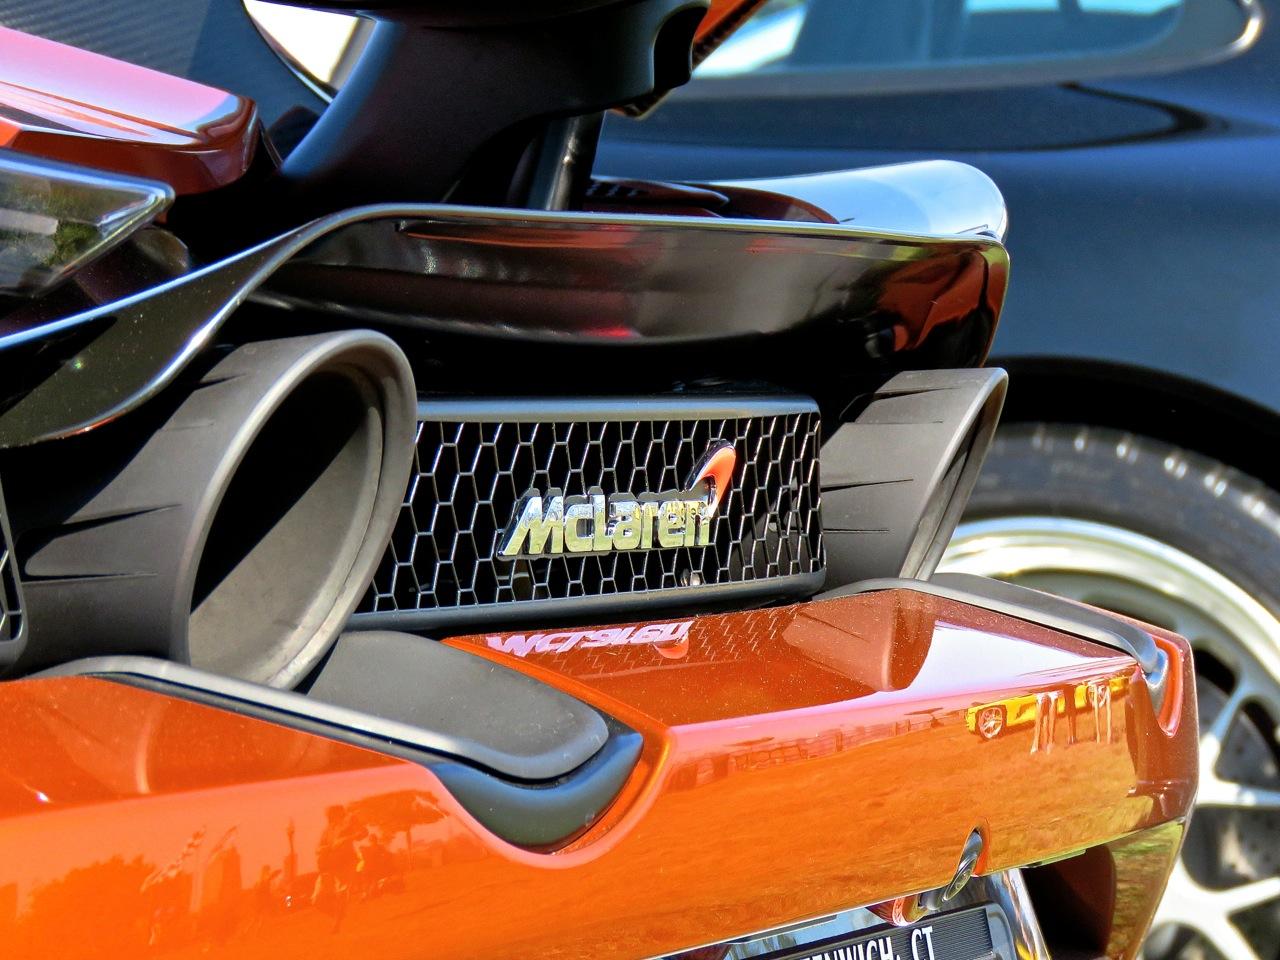 McLaren 720S Driven By Purpose